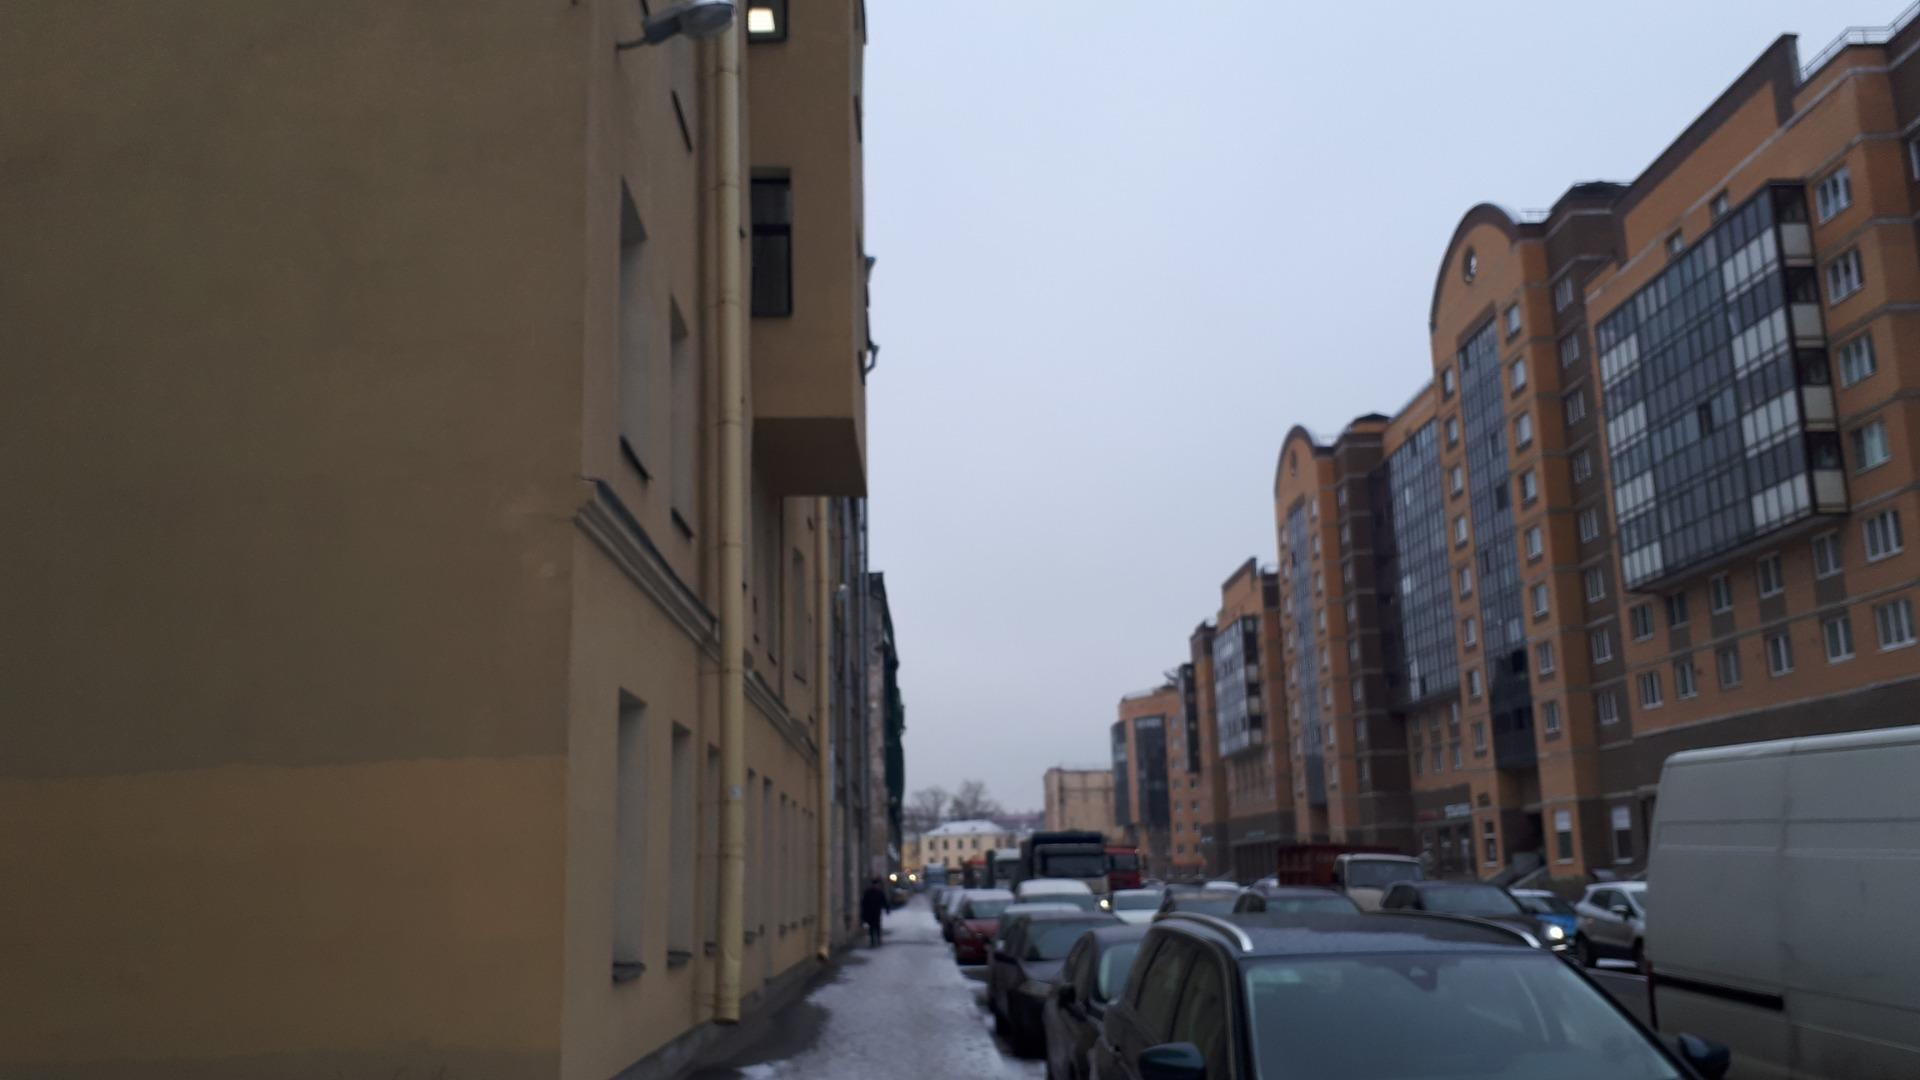 Free Purpose на продажу по адресу Россия, Санкт-Петербург, Санкт-Петербург, улица Шкапина